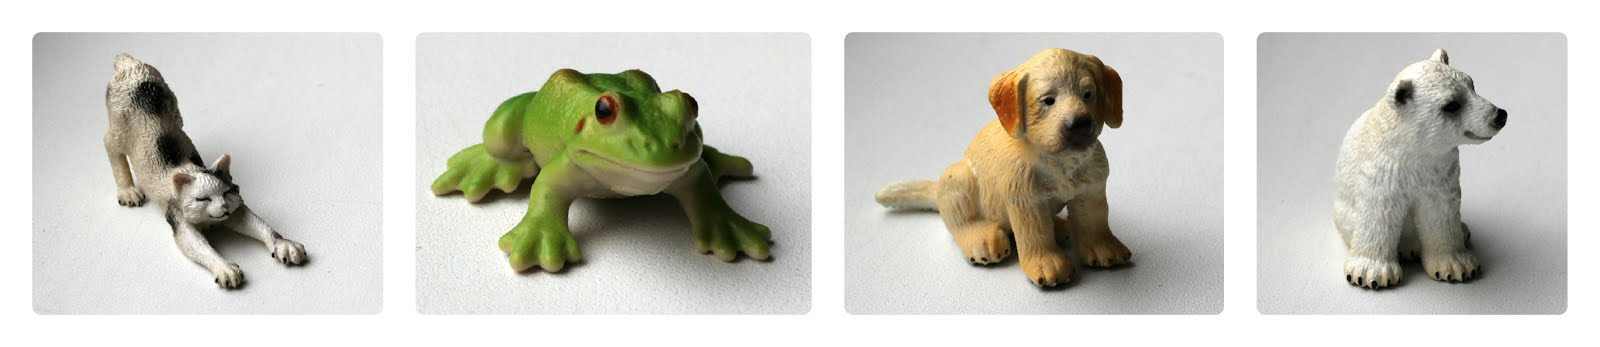 diff_animals.jpg